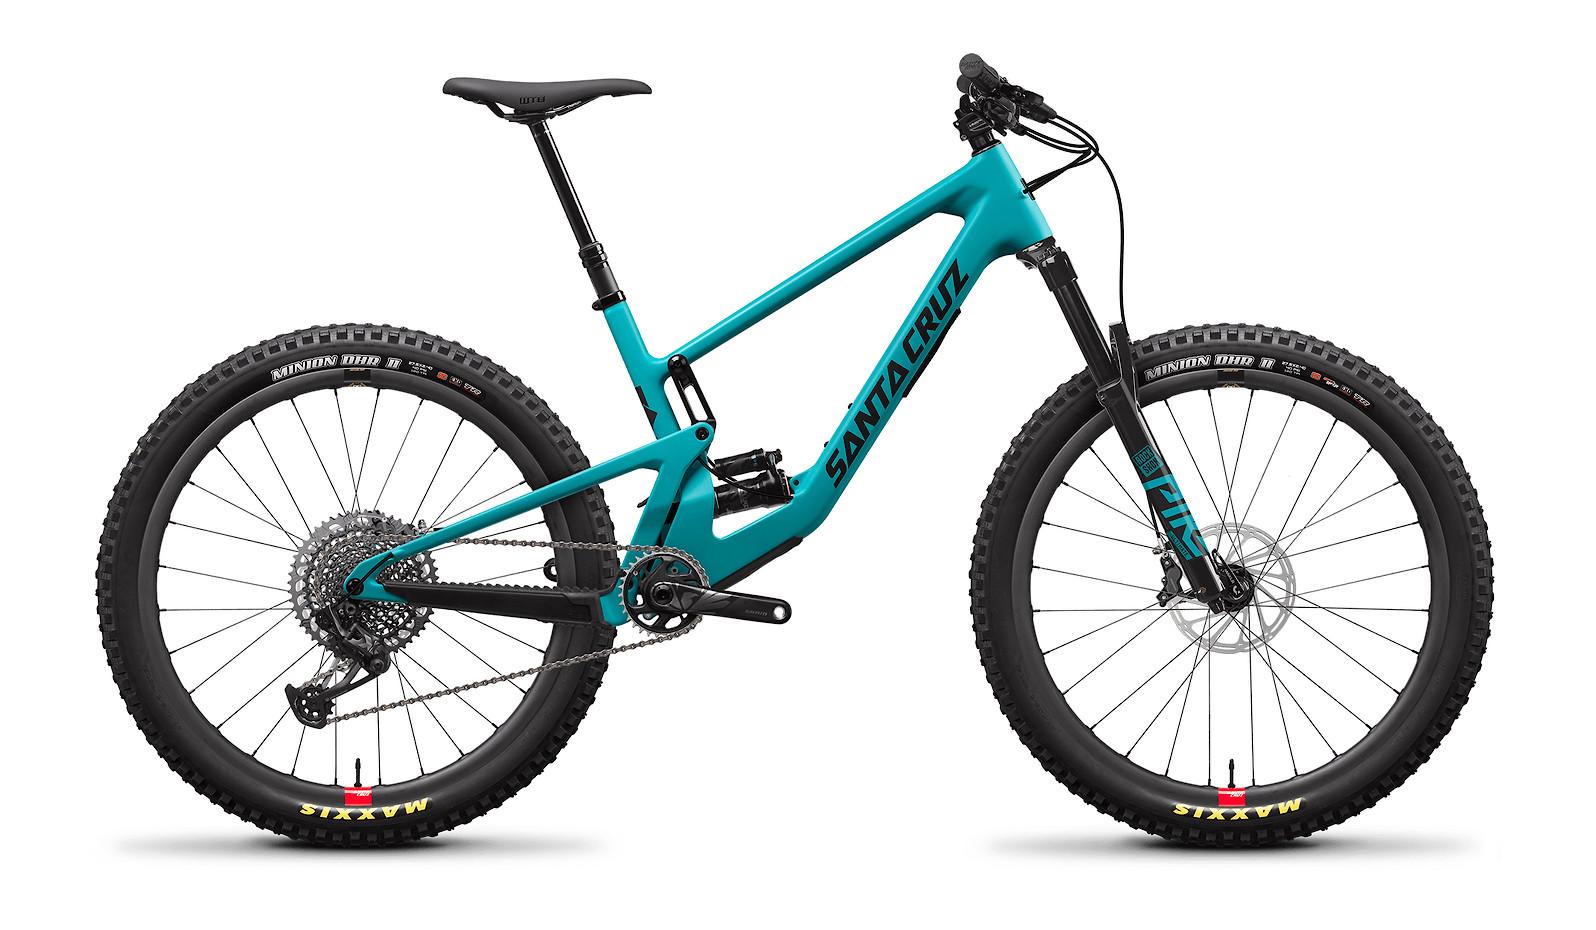 Santa Cruz 5010 Carbon CC Frame (Loosely Blue and Black)